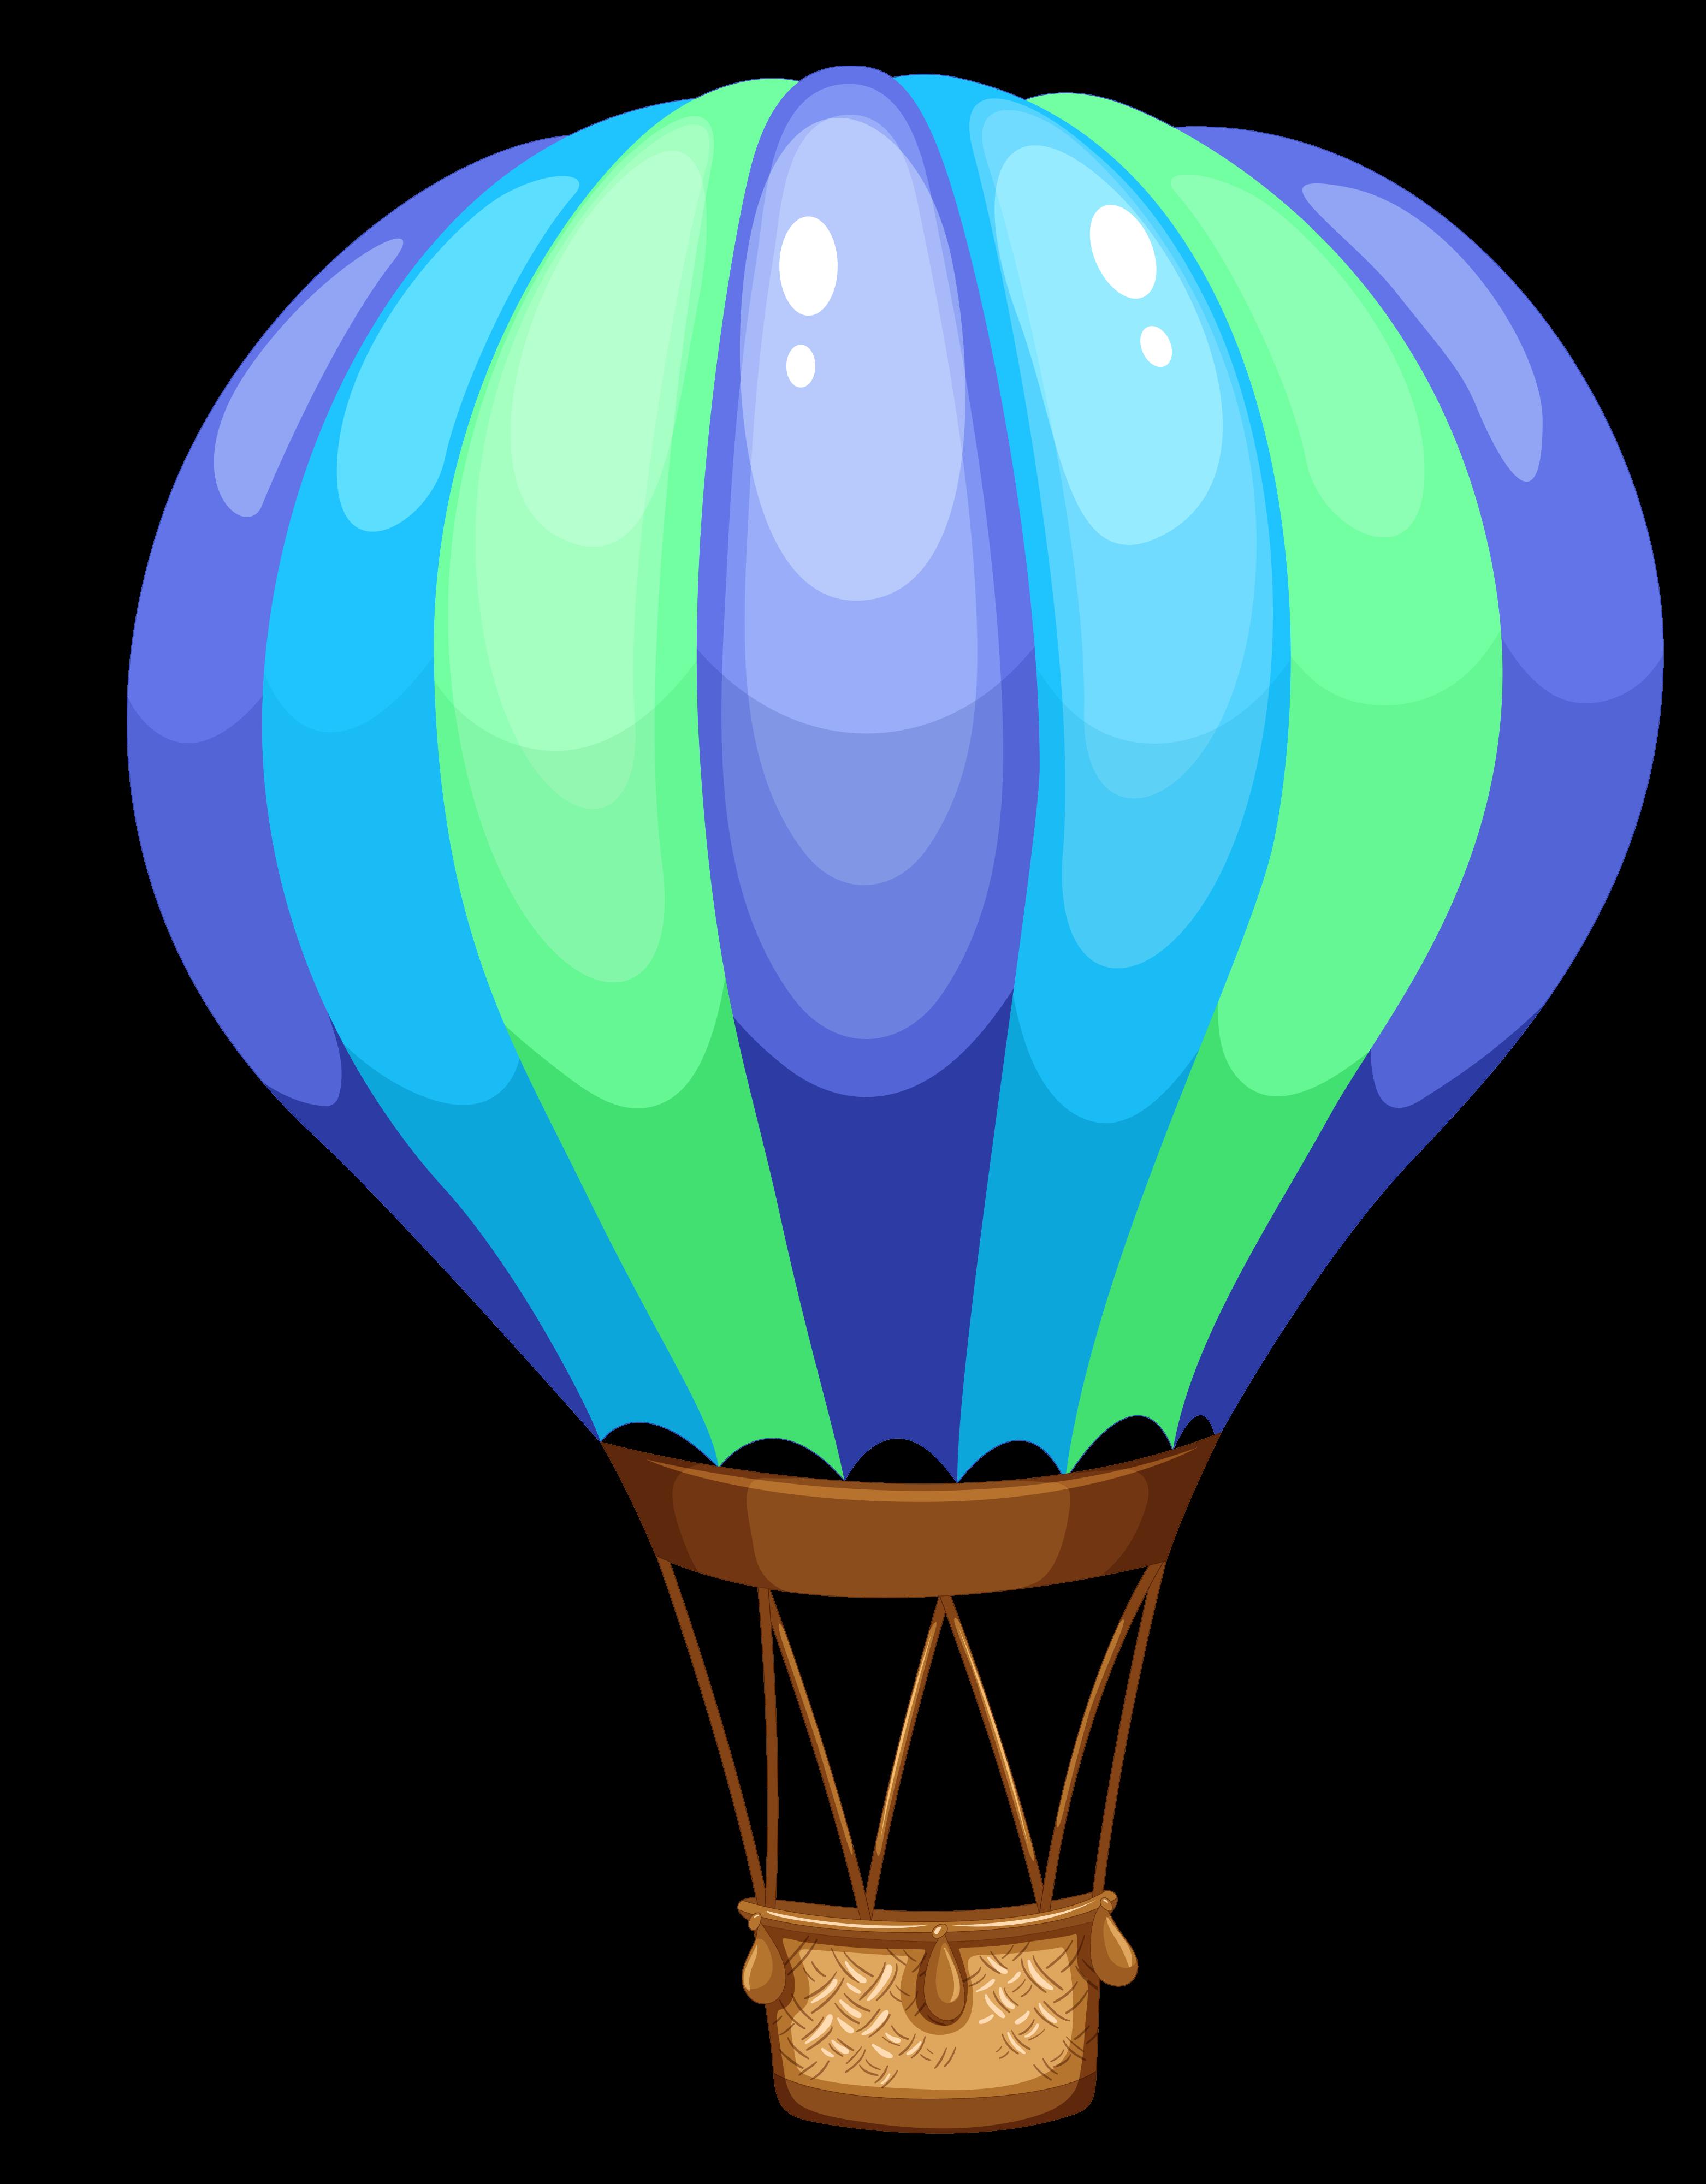 Pin by Unloveable tum*✿* on Balloons ลูกโป่ง.